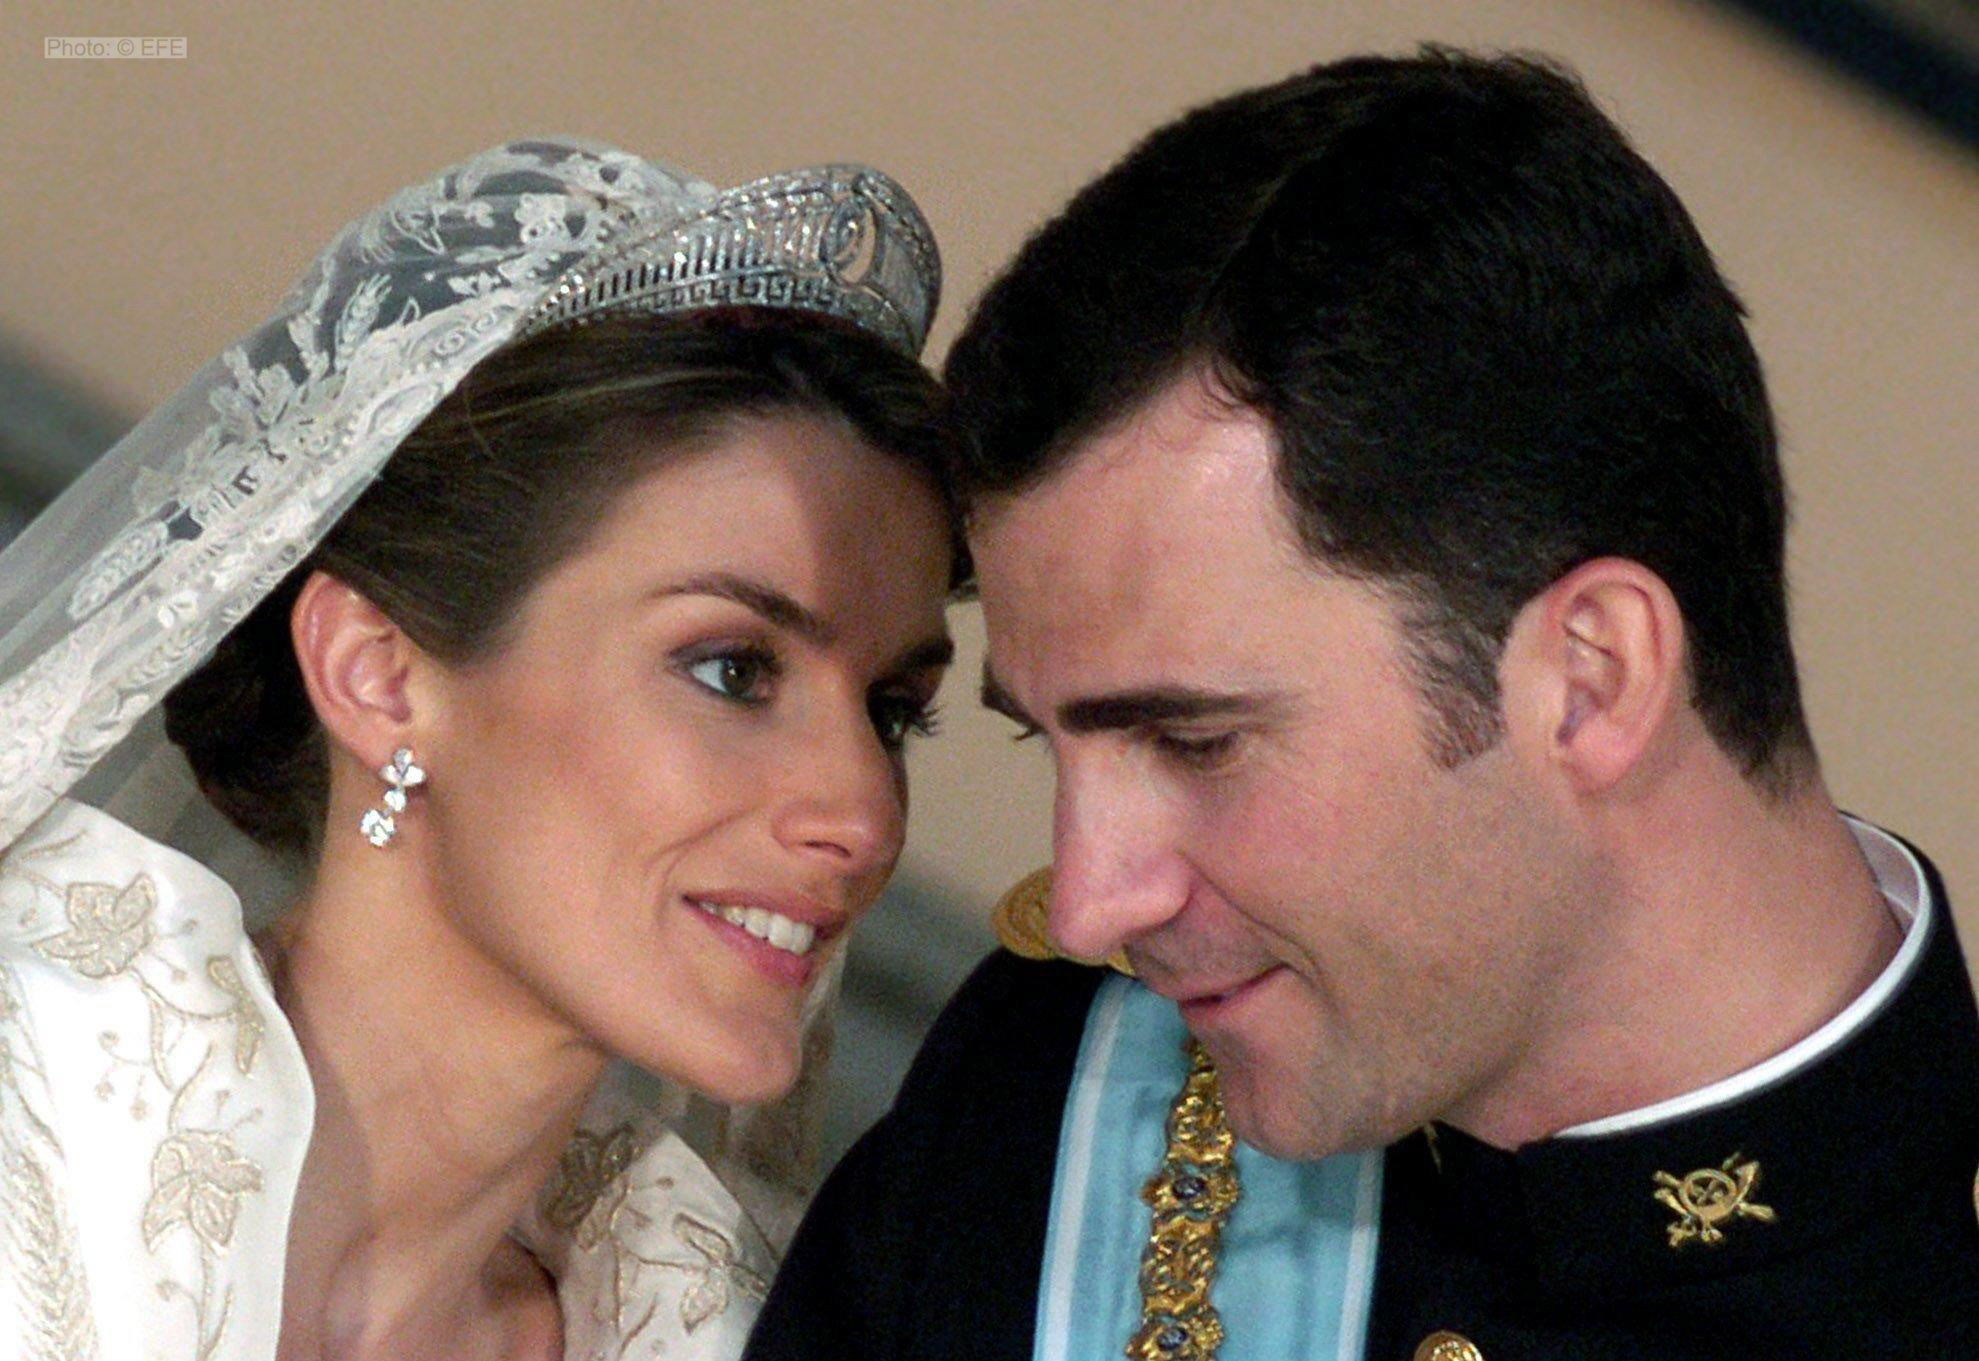 The Wedding Of Crown Prince Felipe Of Spain Royalty Magazine